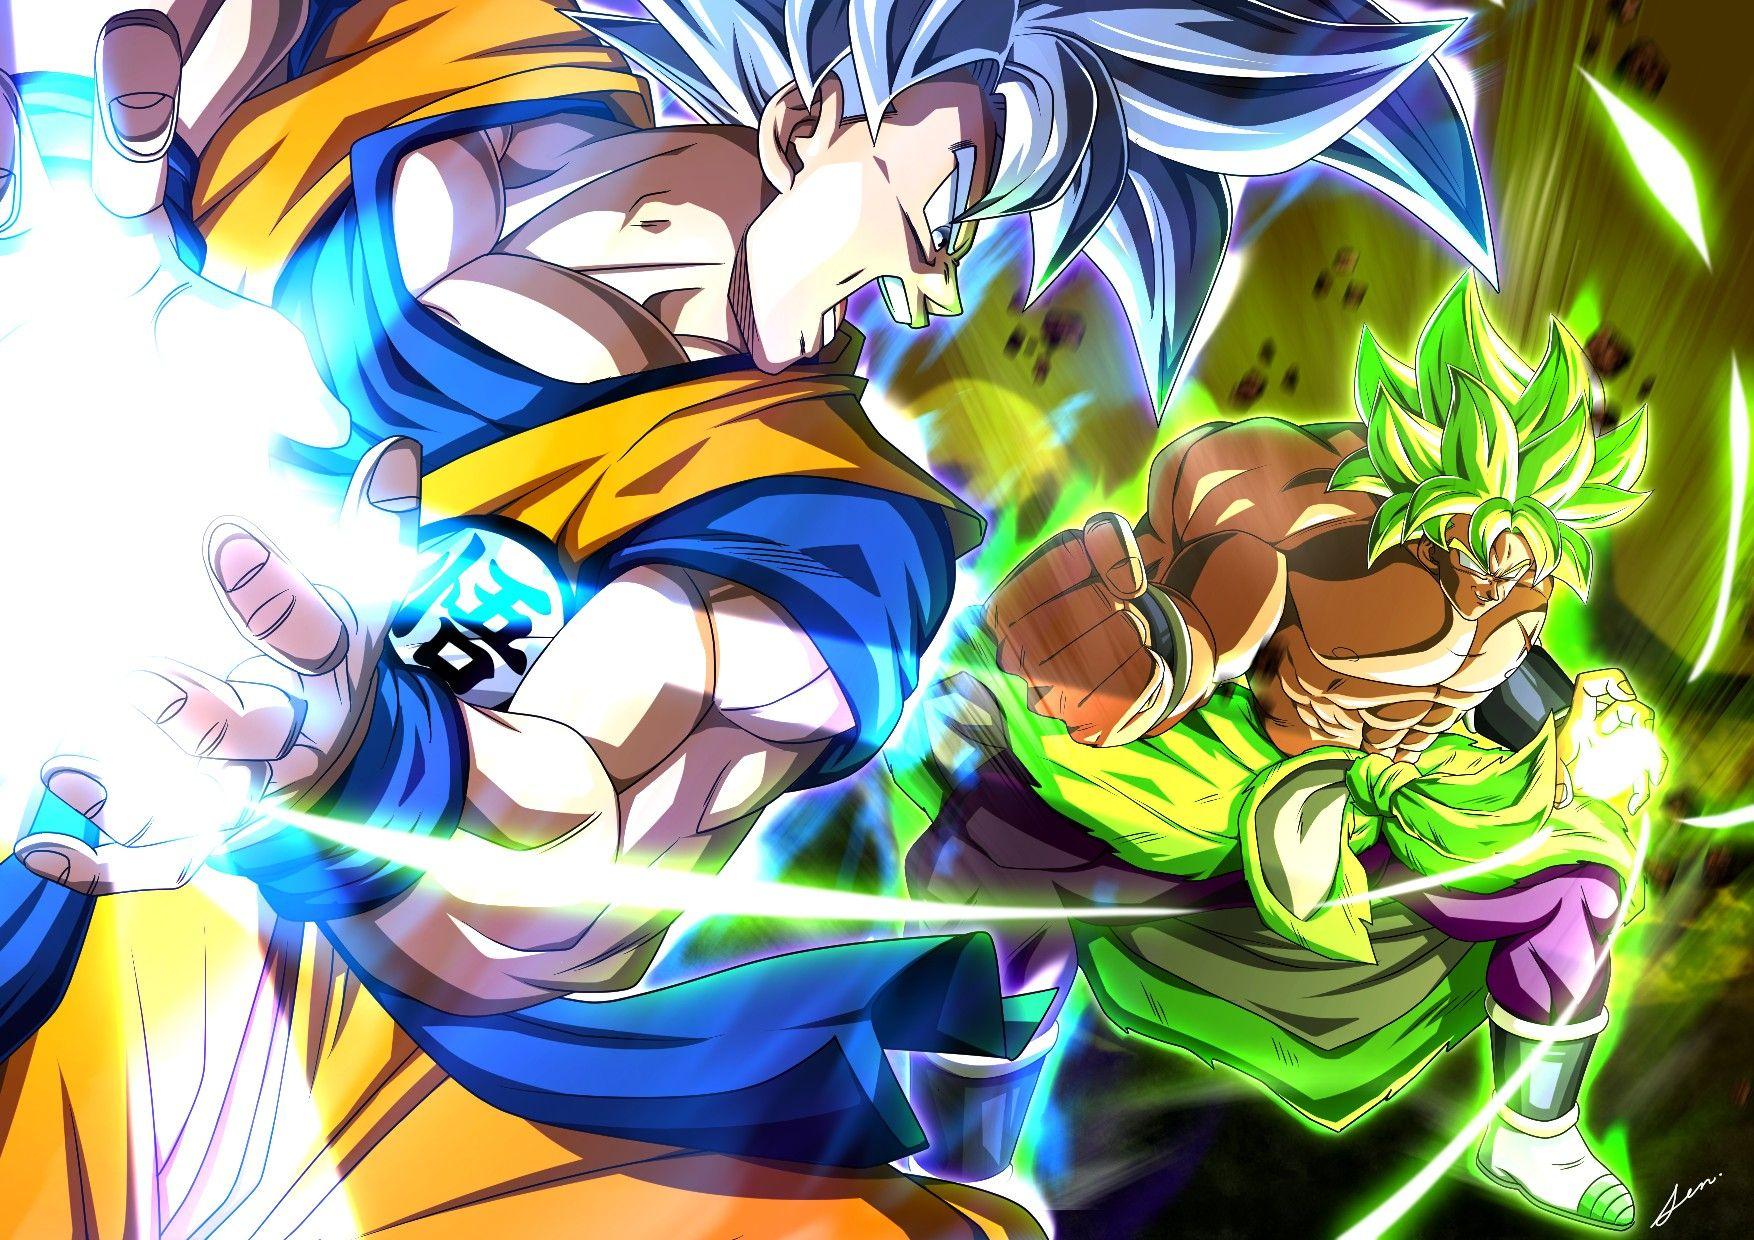 Ultra Instinto Vs Broly Dragon Ball Wallpapers Anime Dragon Ball Super Dragon Ball Artwork